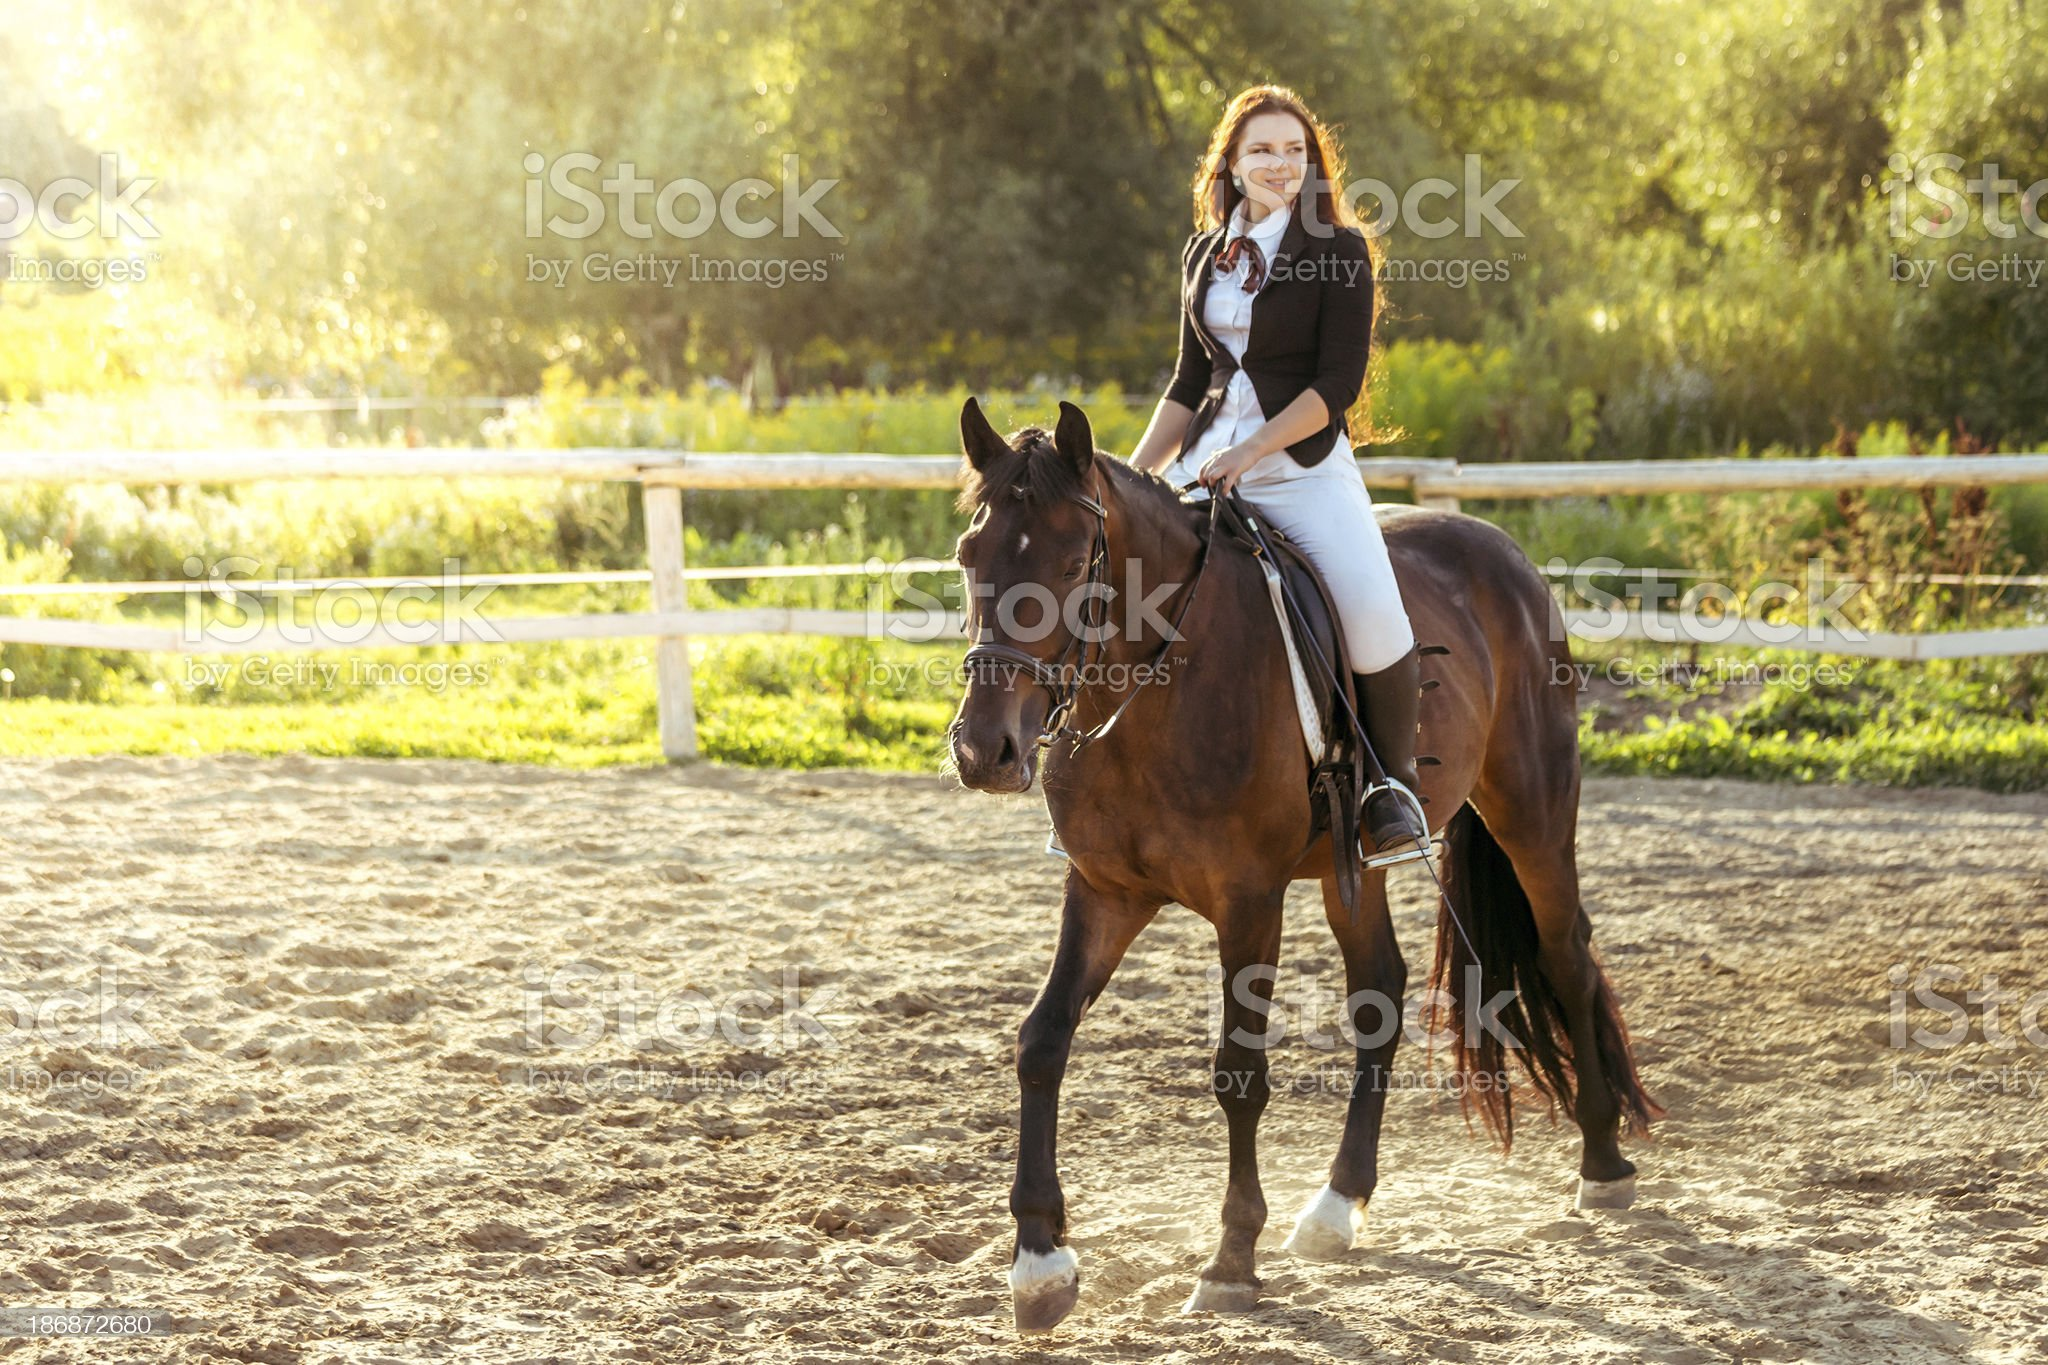 Horseback riding royalty-free stock photo